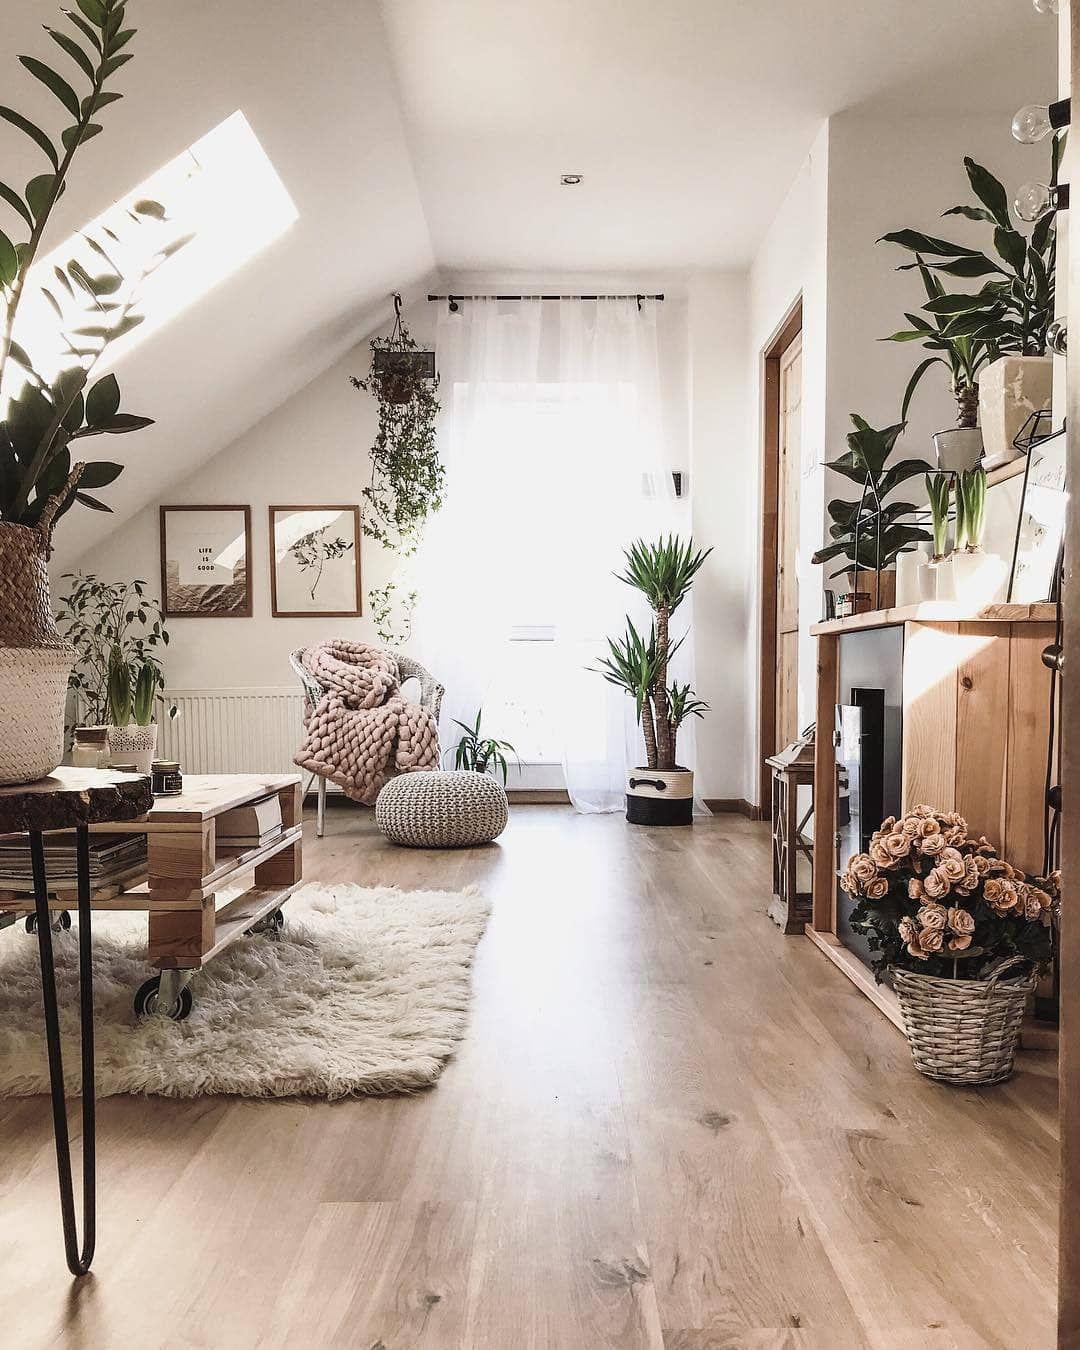 Country Styleinterior Design: #olivrahomedecor#livingroomgoals#livingroomideas